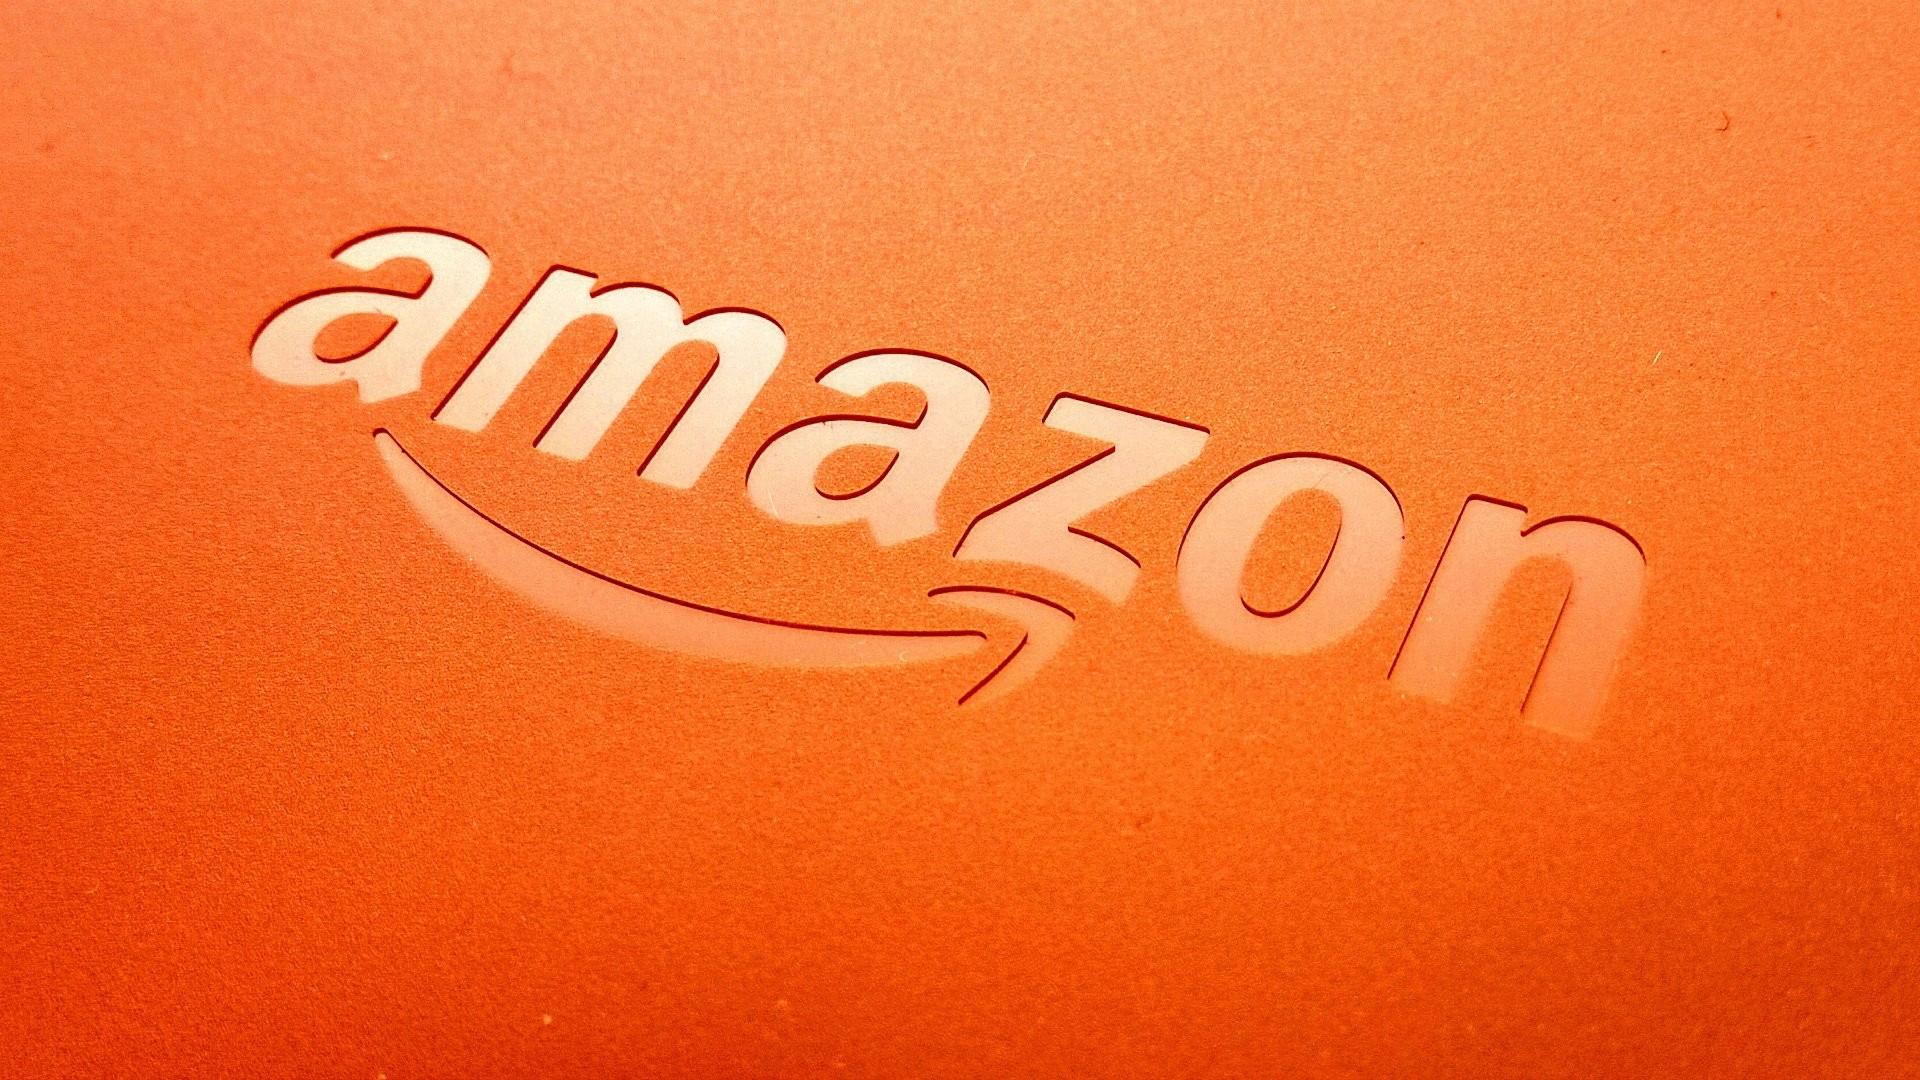 Amazon hd wallpaper download